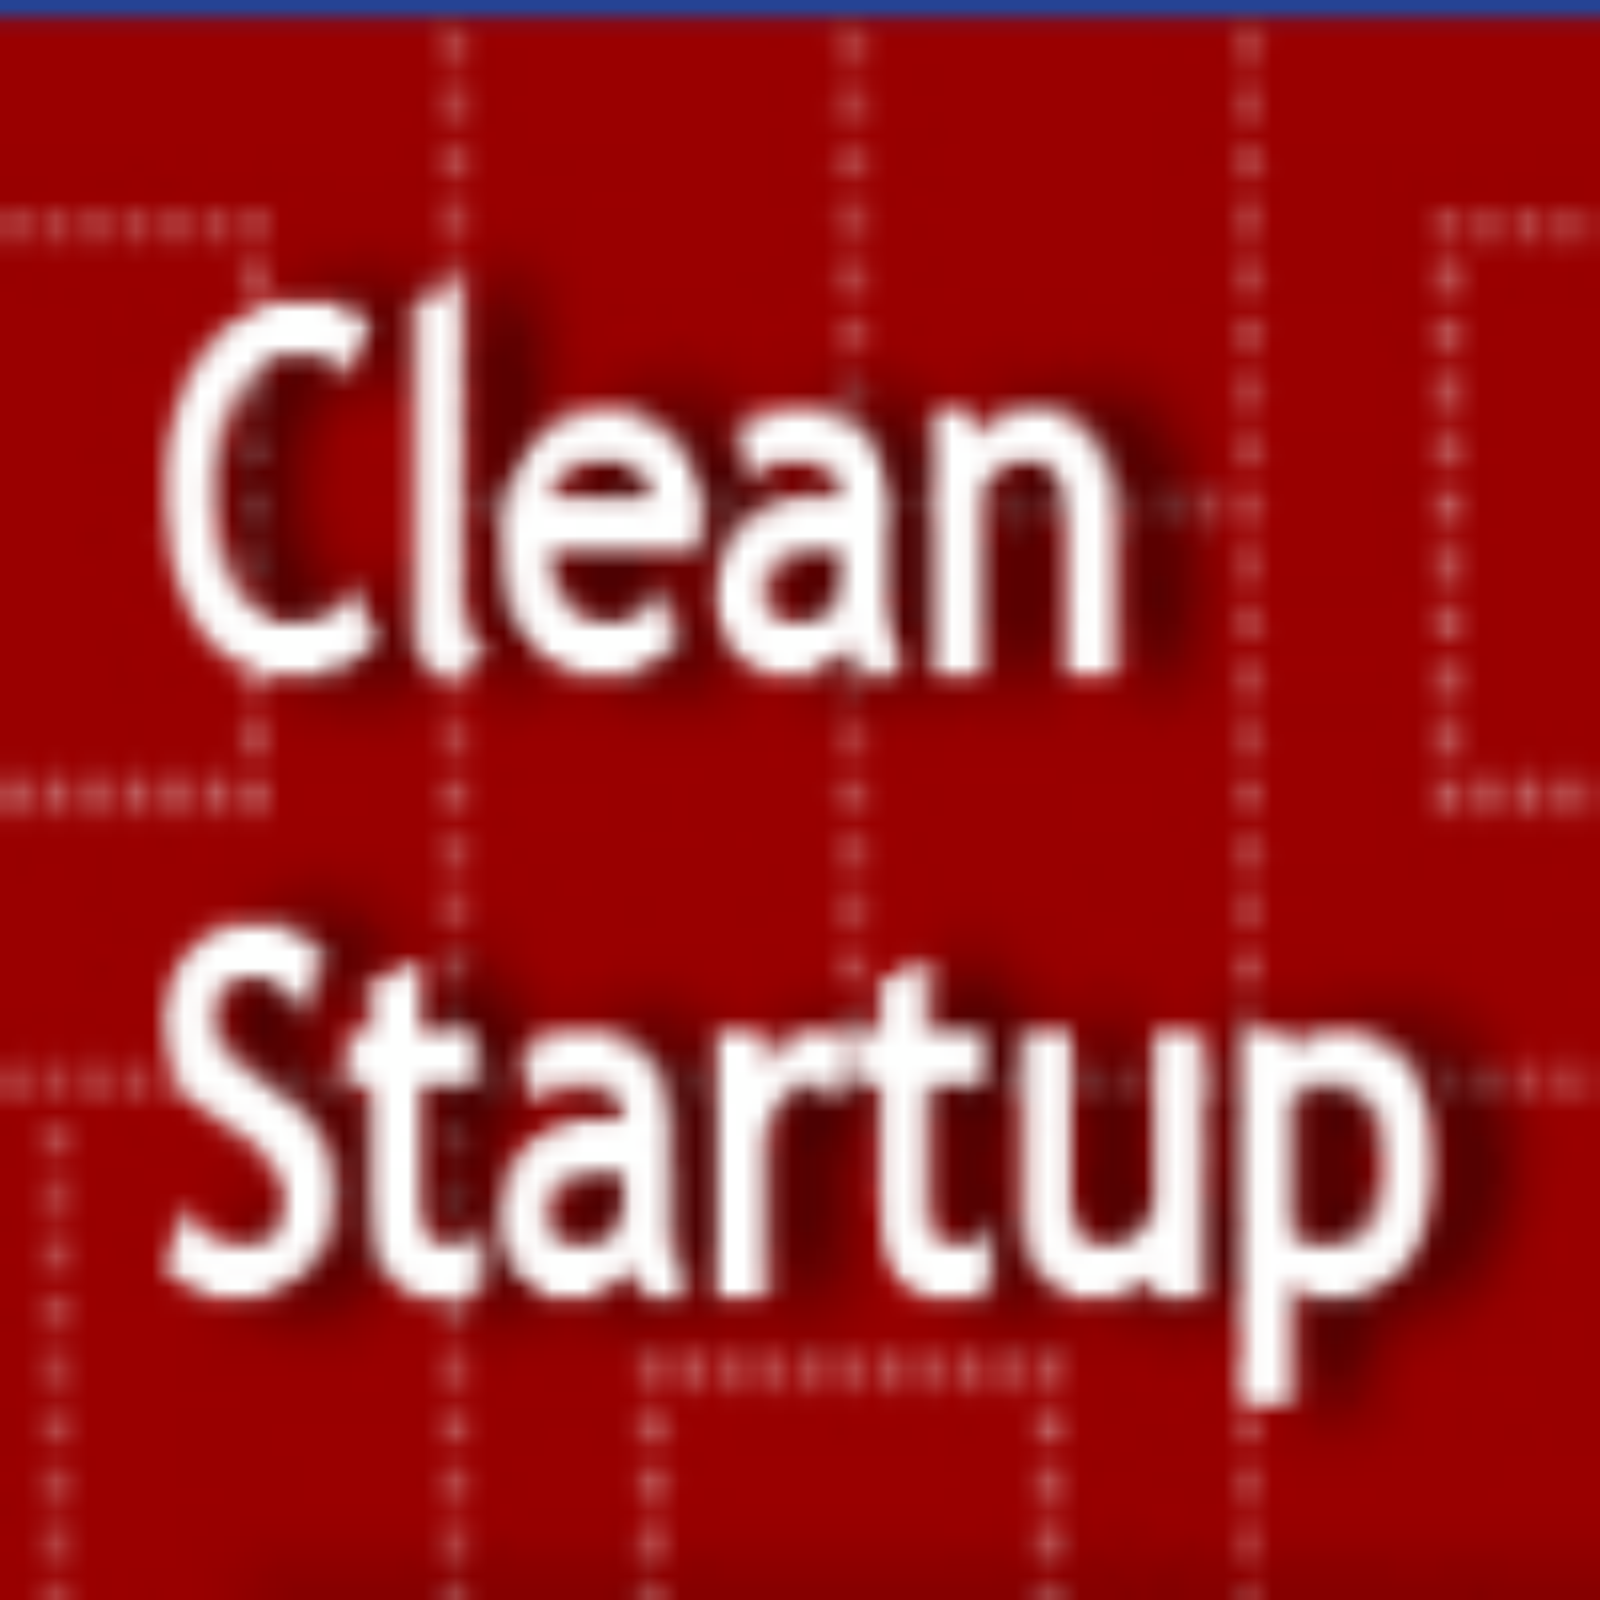 Clean Startup